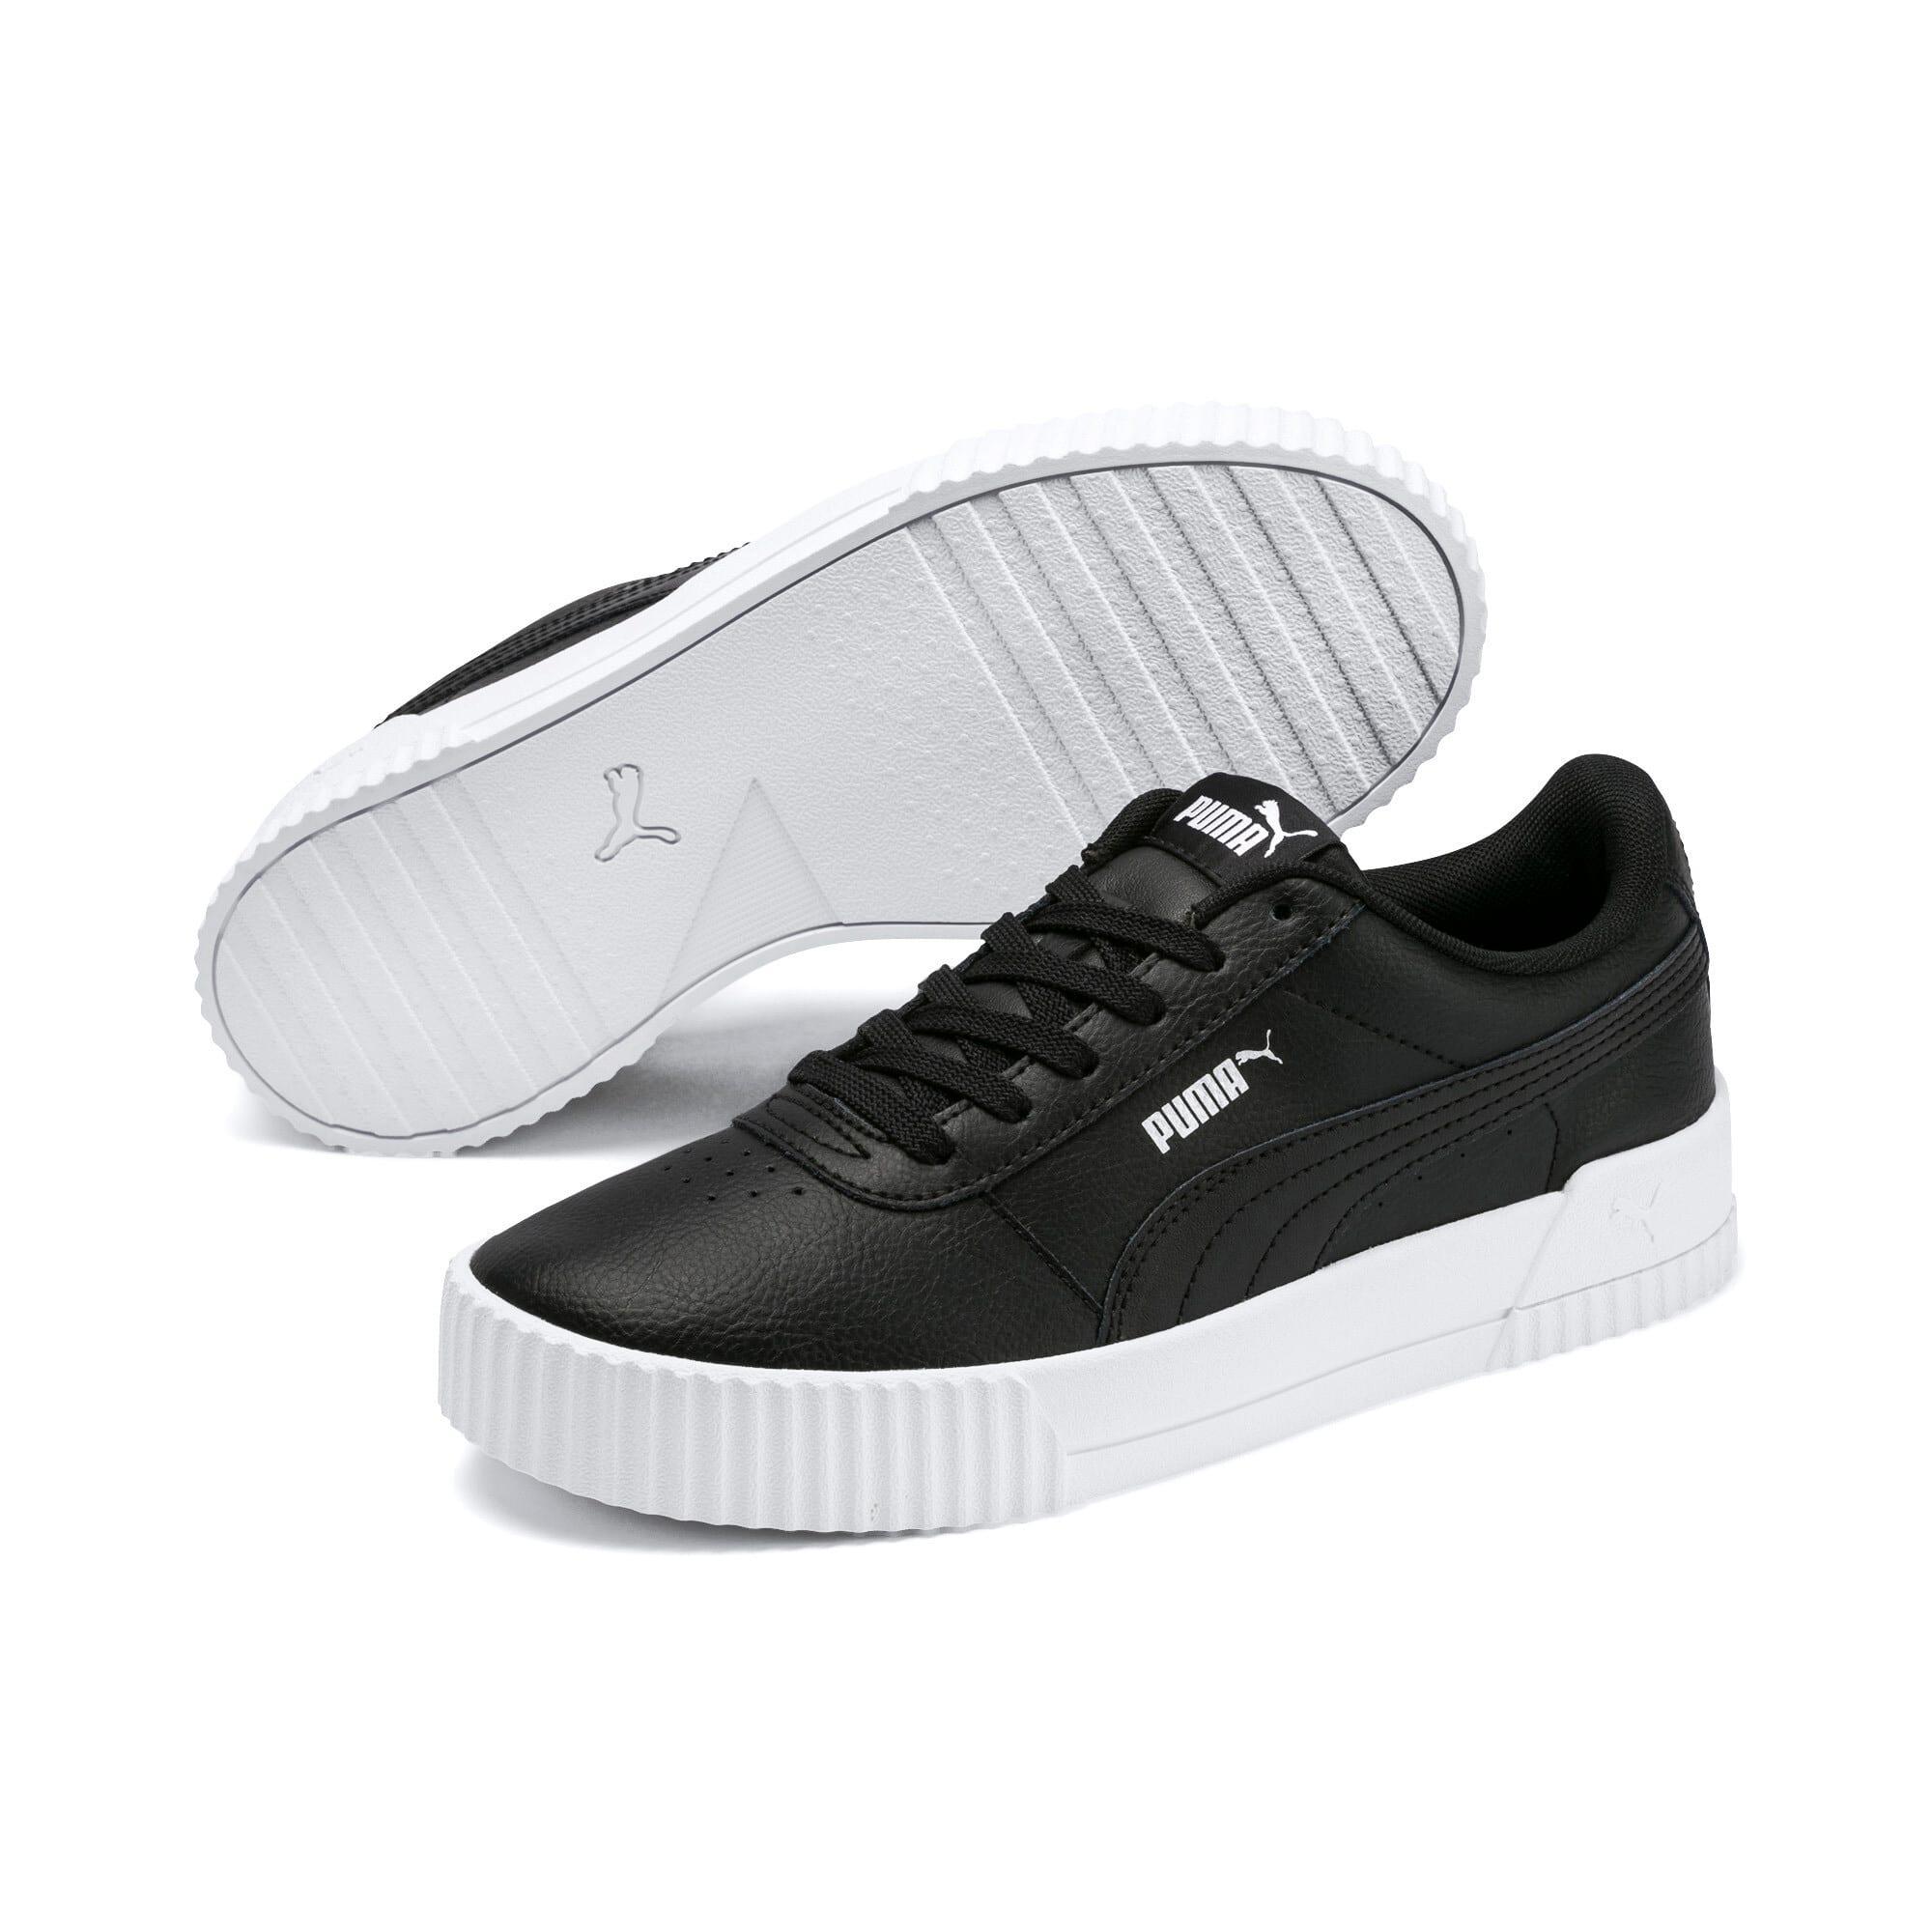 Thumbnail 3 of Carina Leather Women's Sneakers, Puma Black- White-Silver, medium